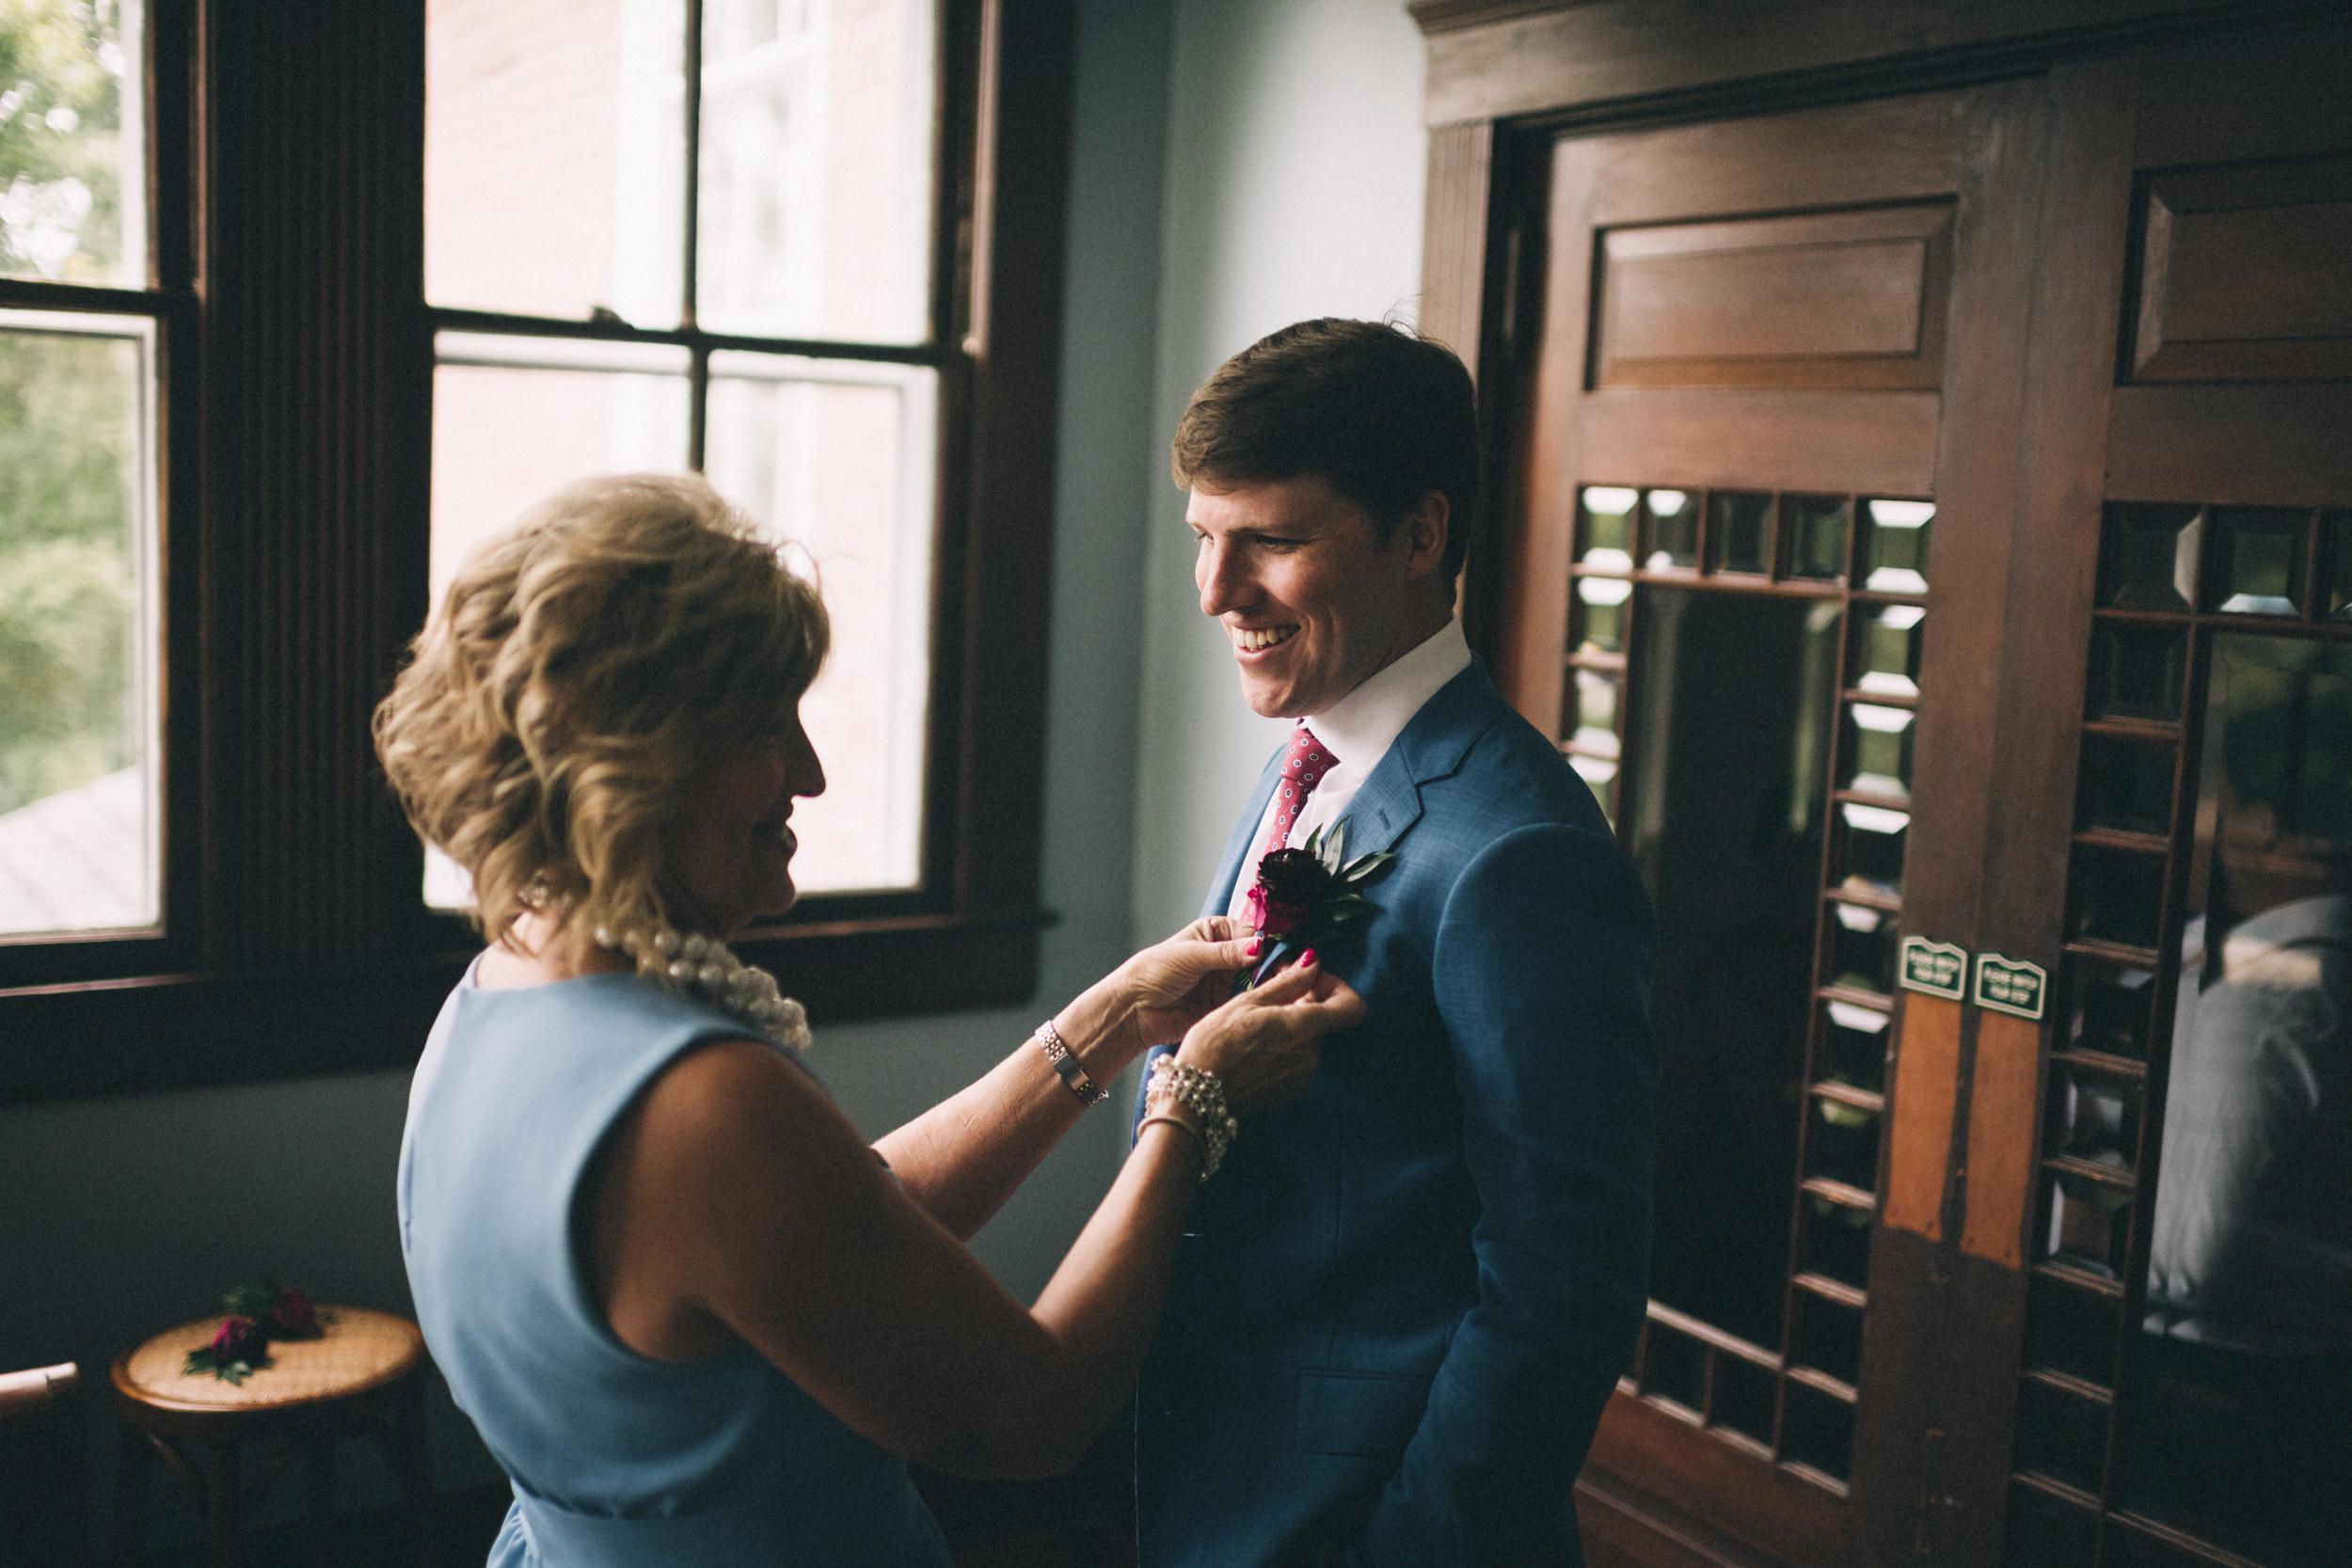 Louisville-Kentucky-Wedding-and-Elopement-Photographer-Sarah-Katherine-Davis-Photography-Summer-Jewel-Toned-Wedding-Chineese-Tea-Ceremony-Warrenwood-Manor-Danville-148.jpg